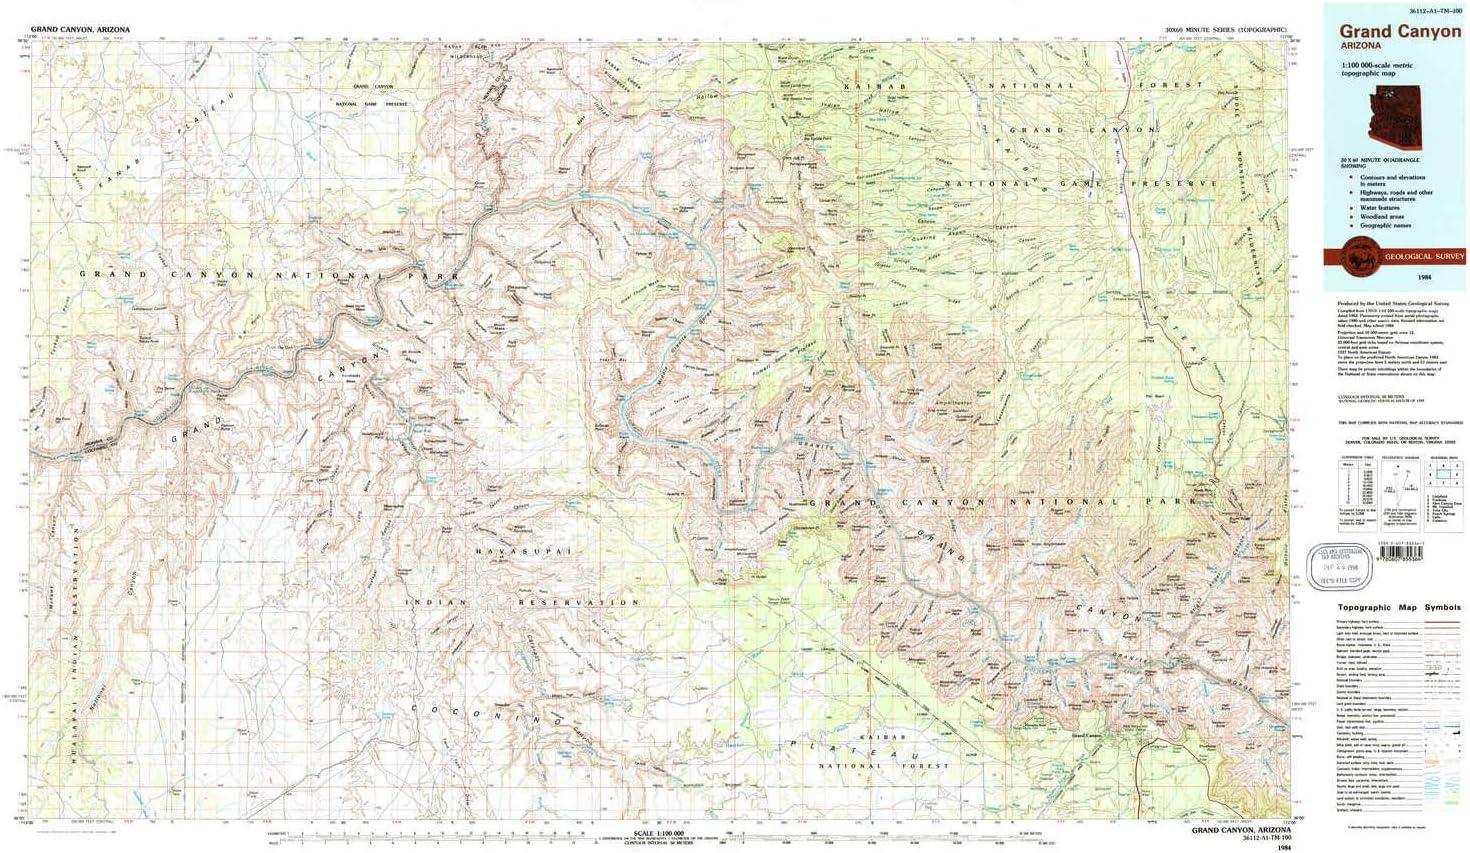 Grand Canyon Topographic Map Amazon.: YellowMaps Grand Canyon AZ topo map, 1:100000 Scale